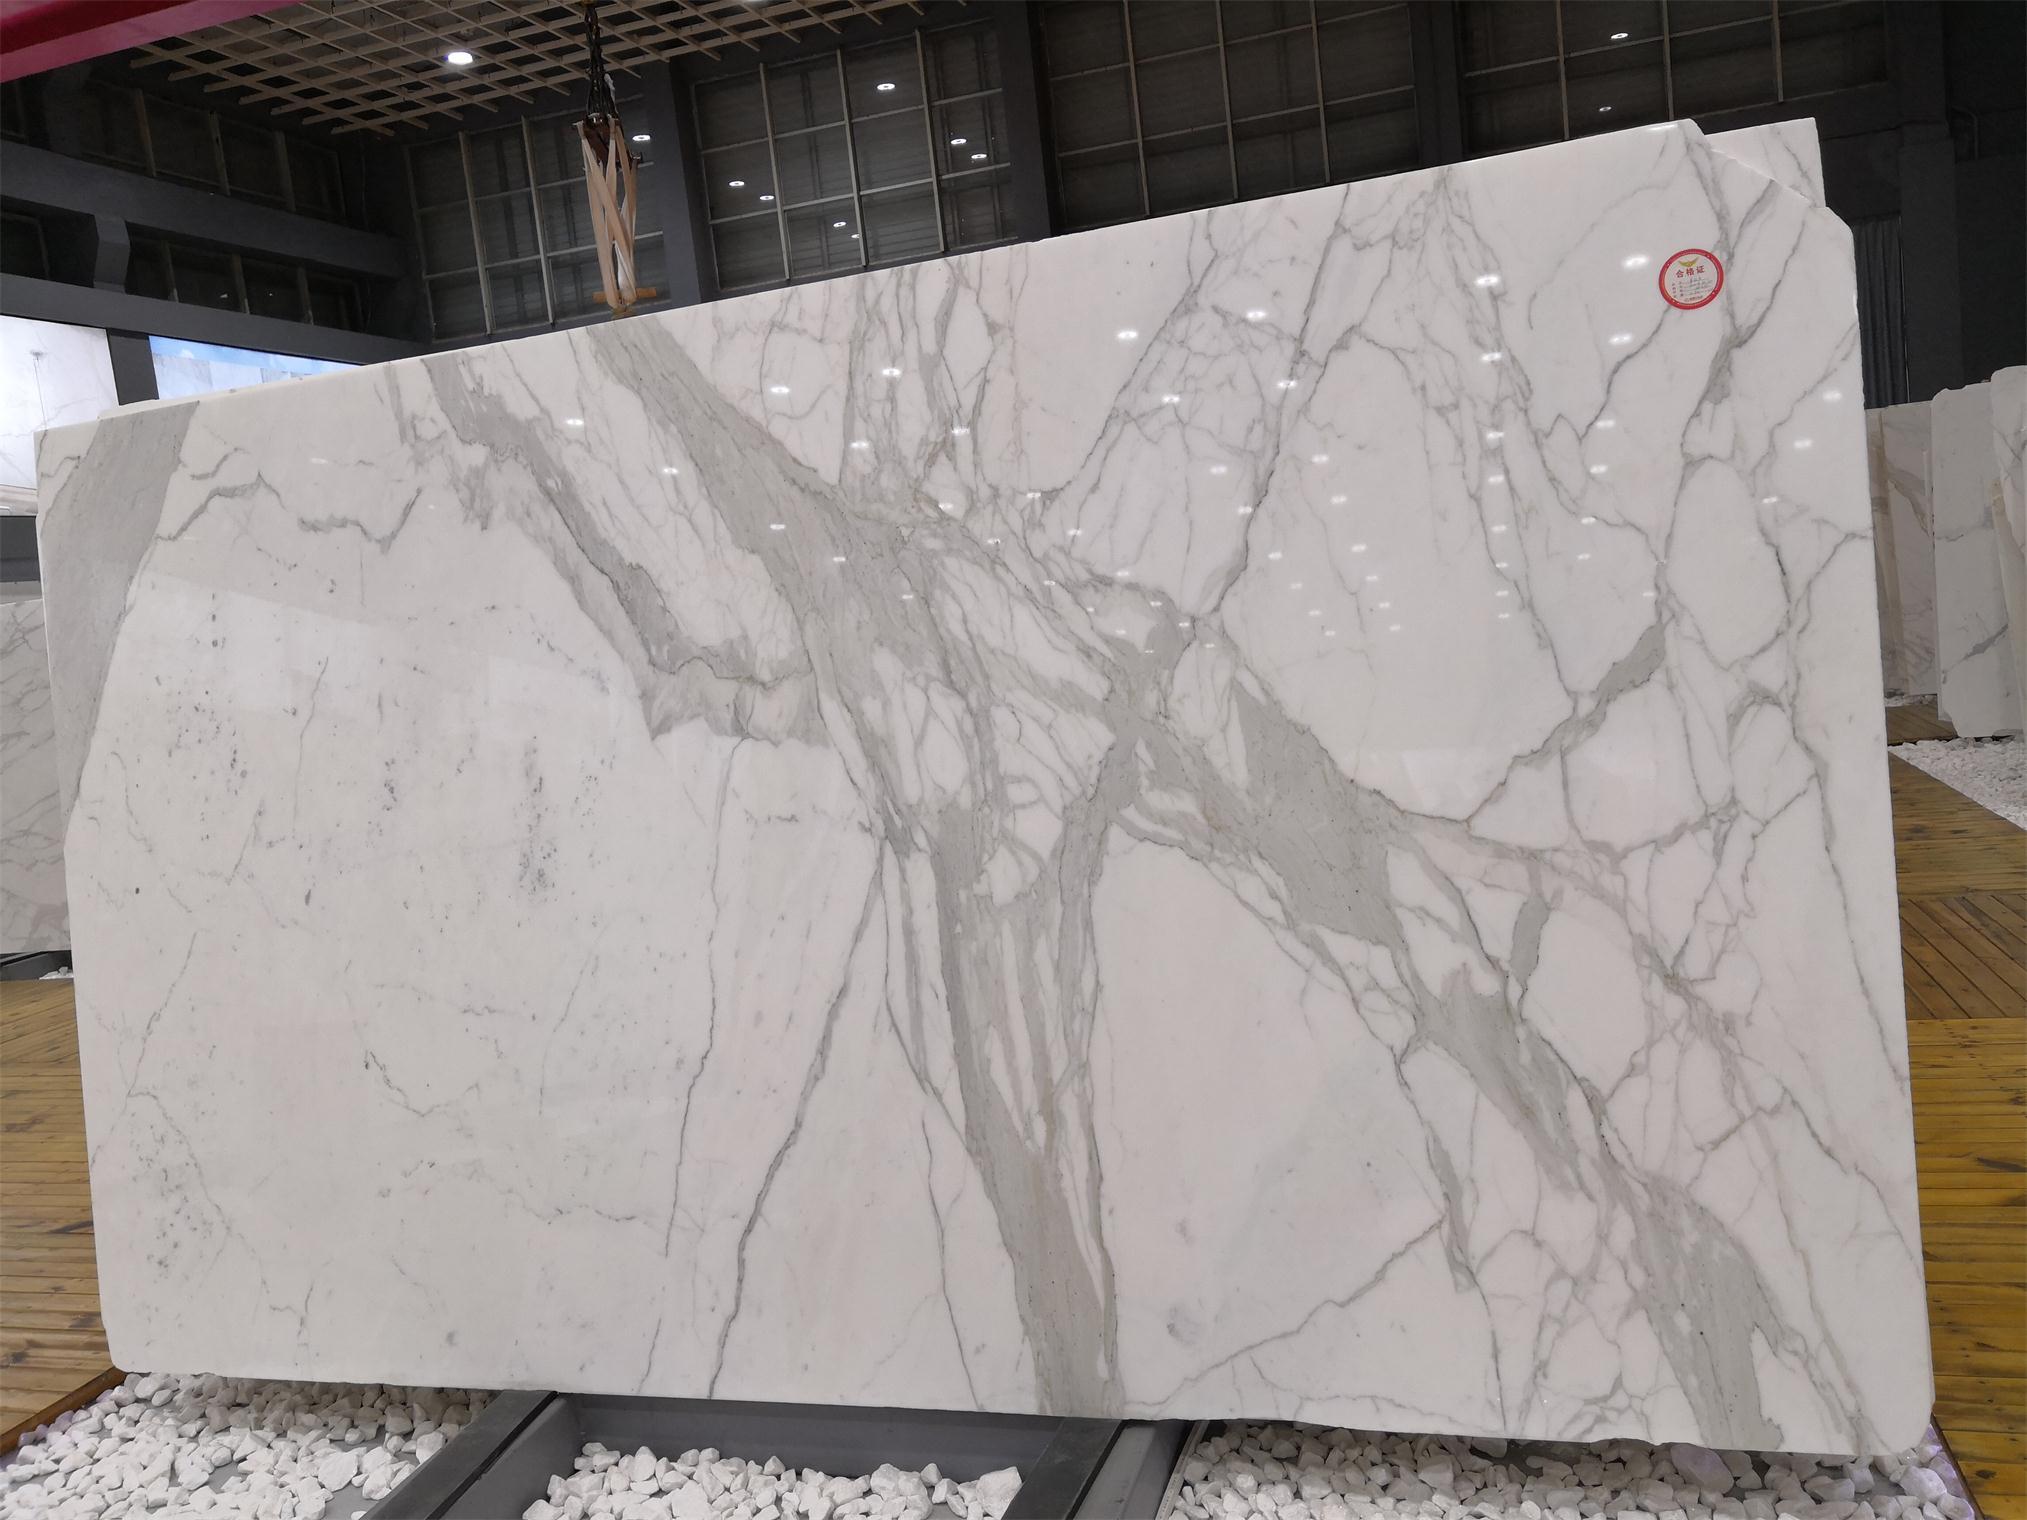 White Calacatta Marble-Slabs Polished White Marble Slabs